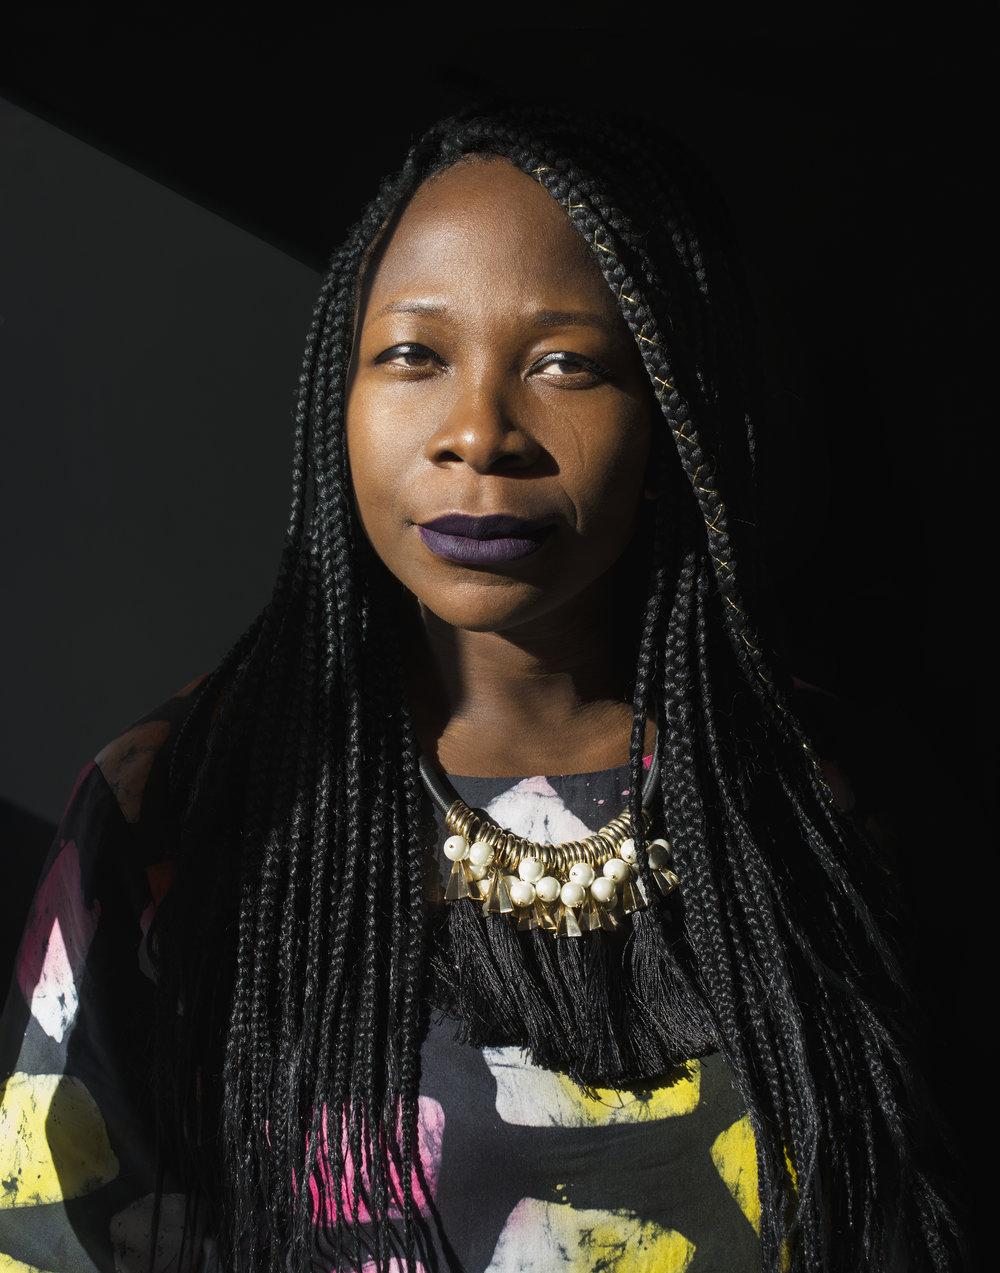 Busayo / Fashion Designer